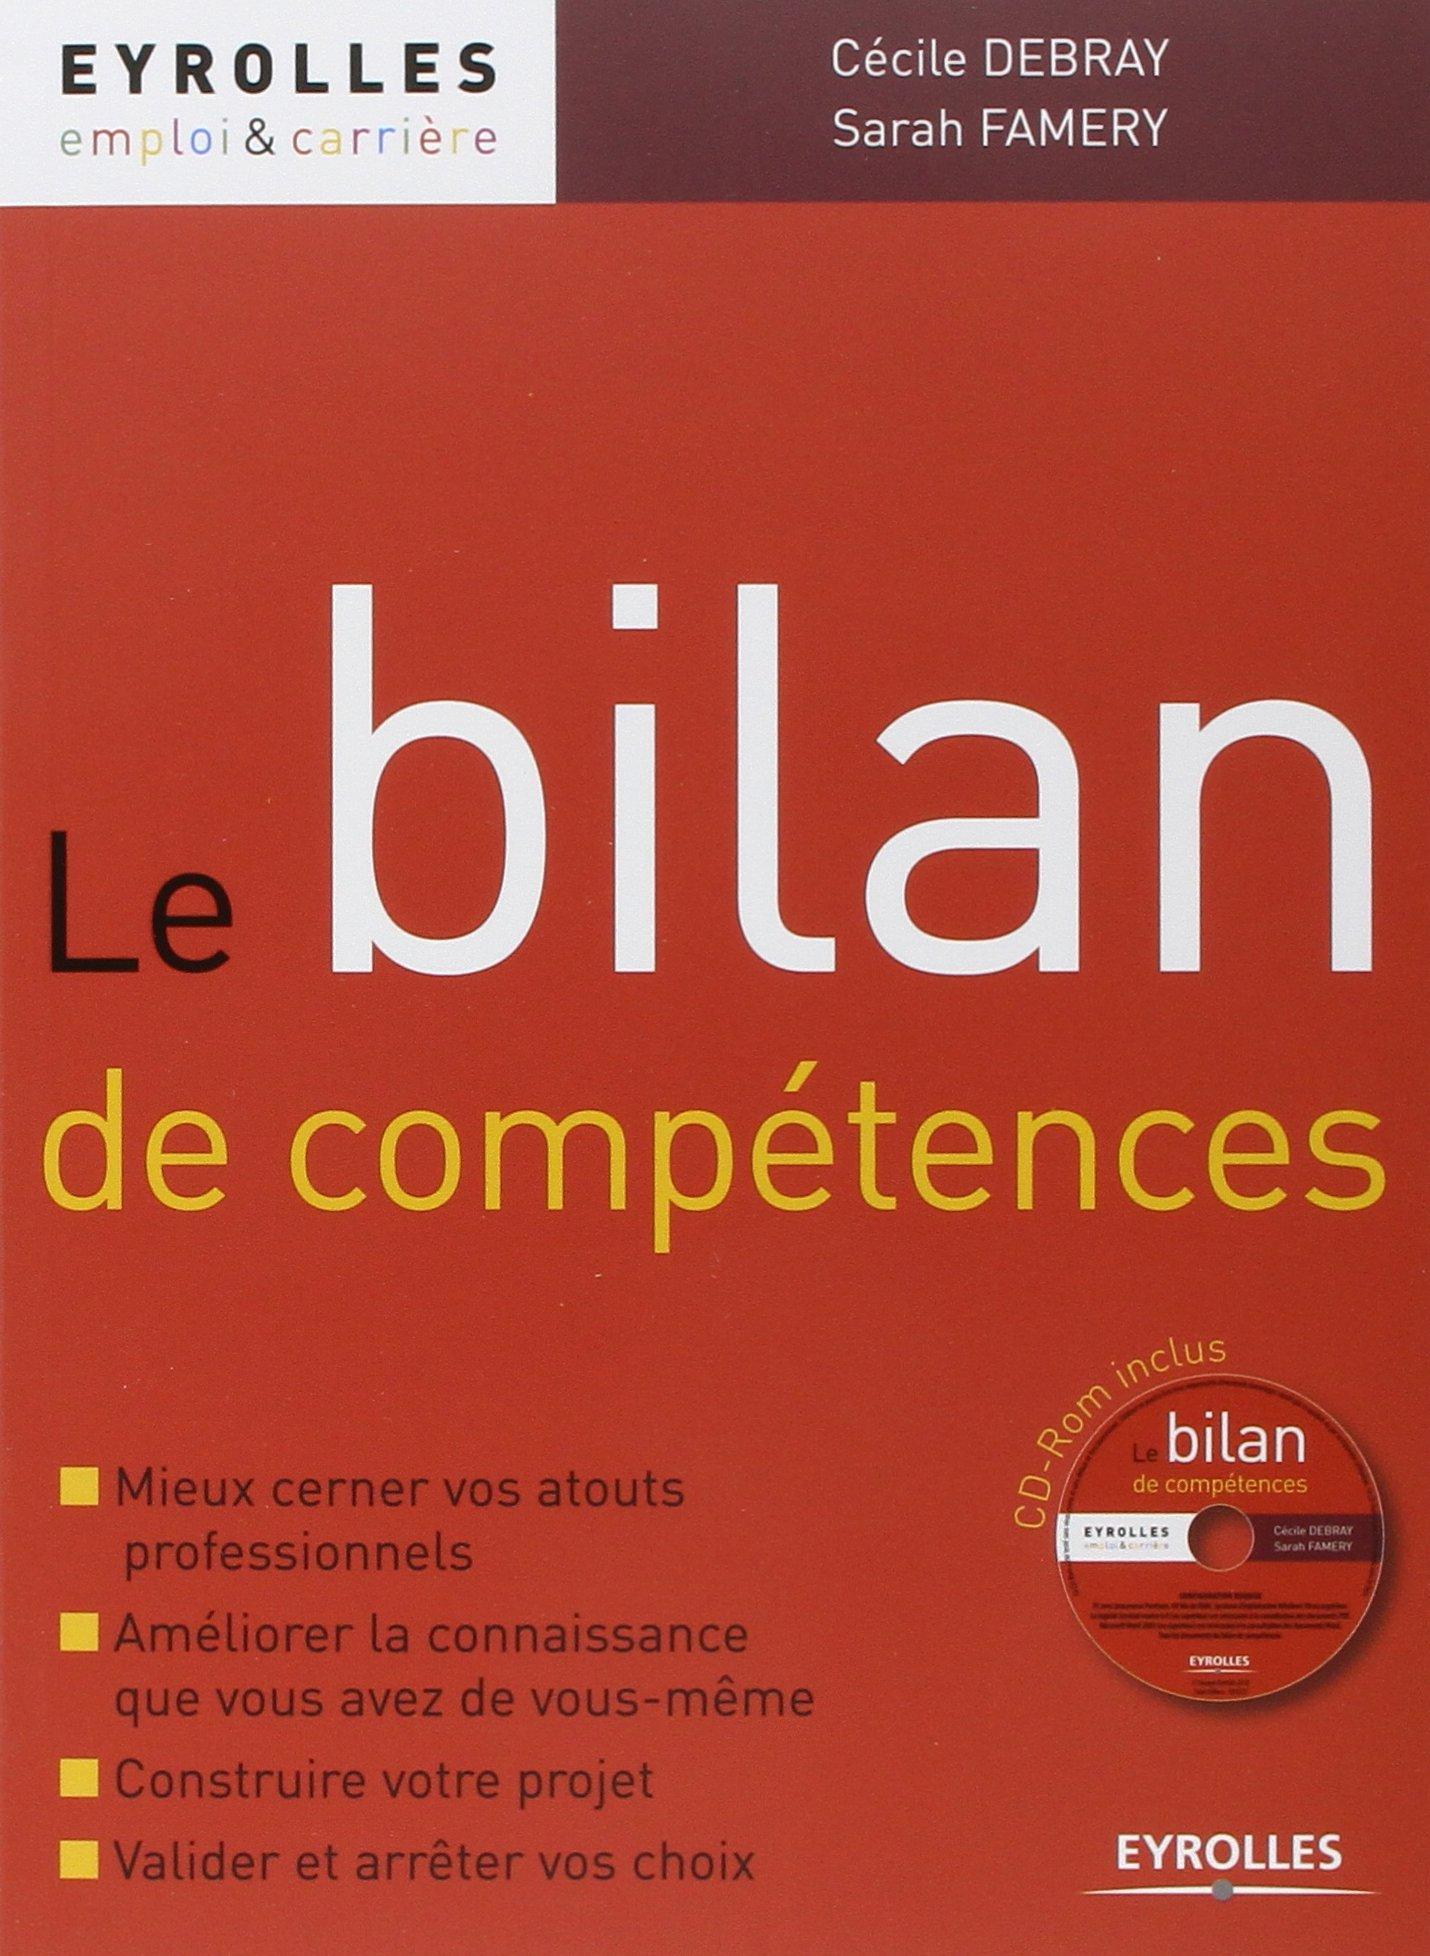 bilan des competences